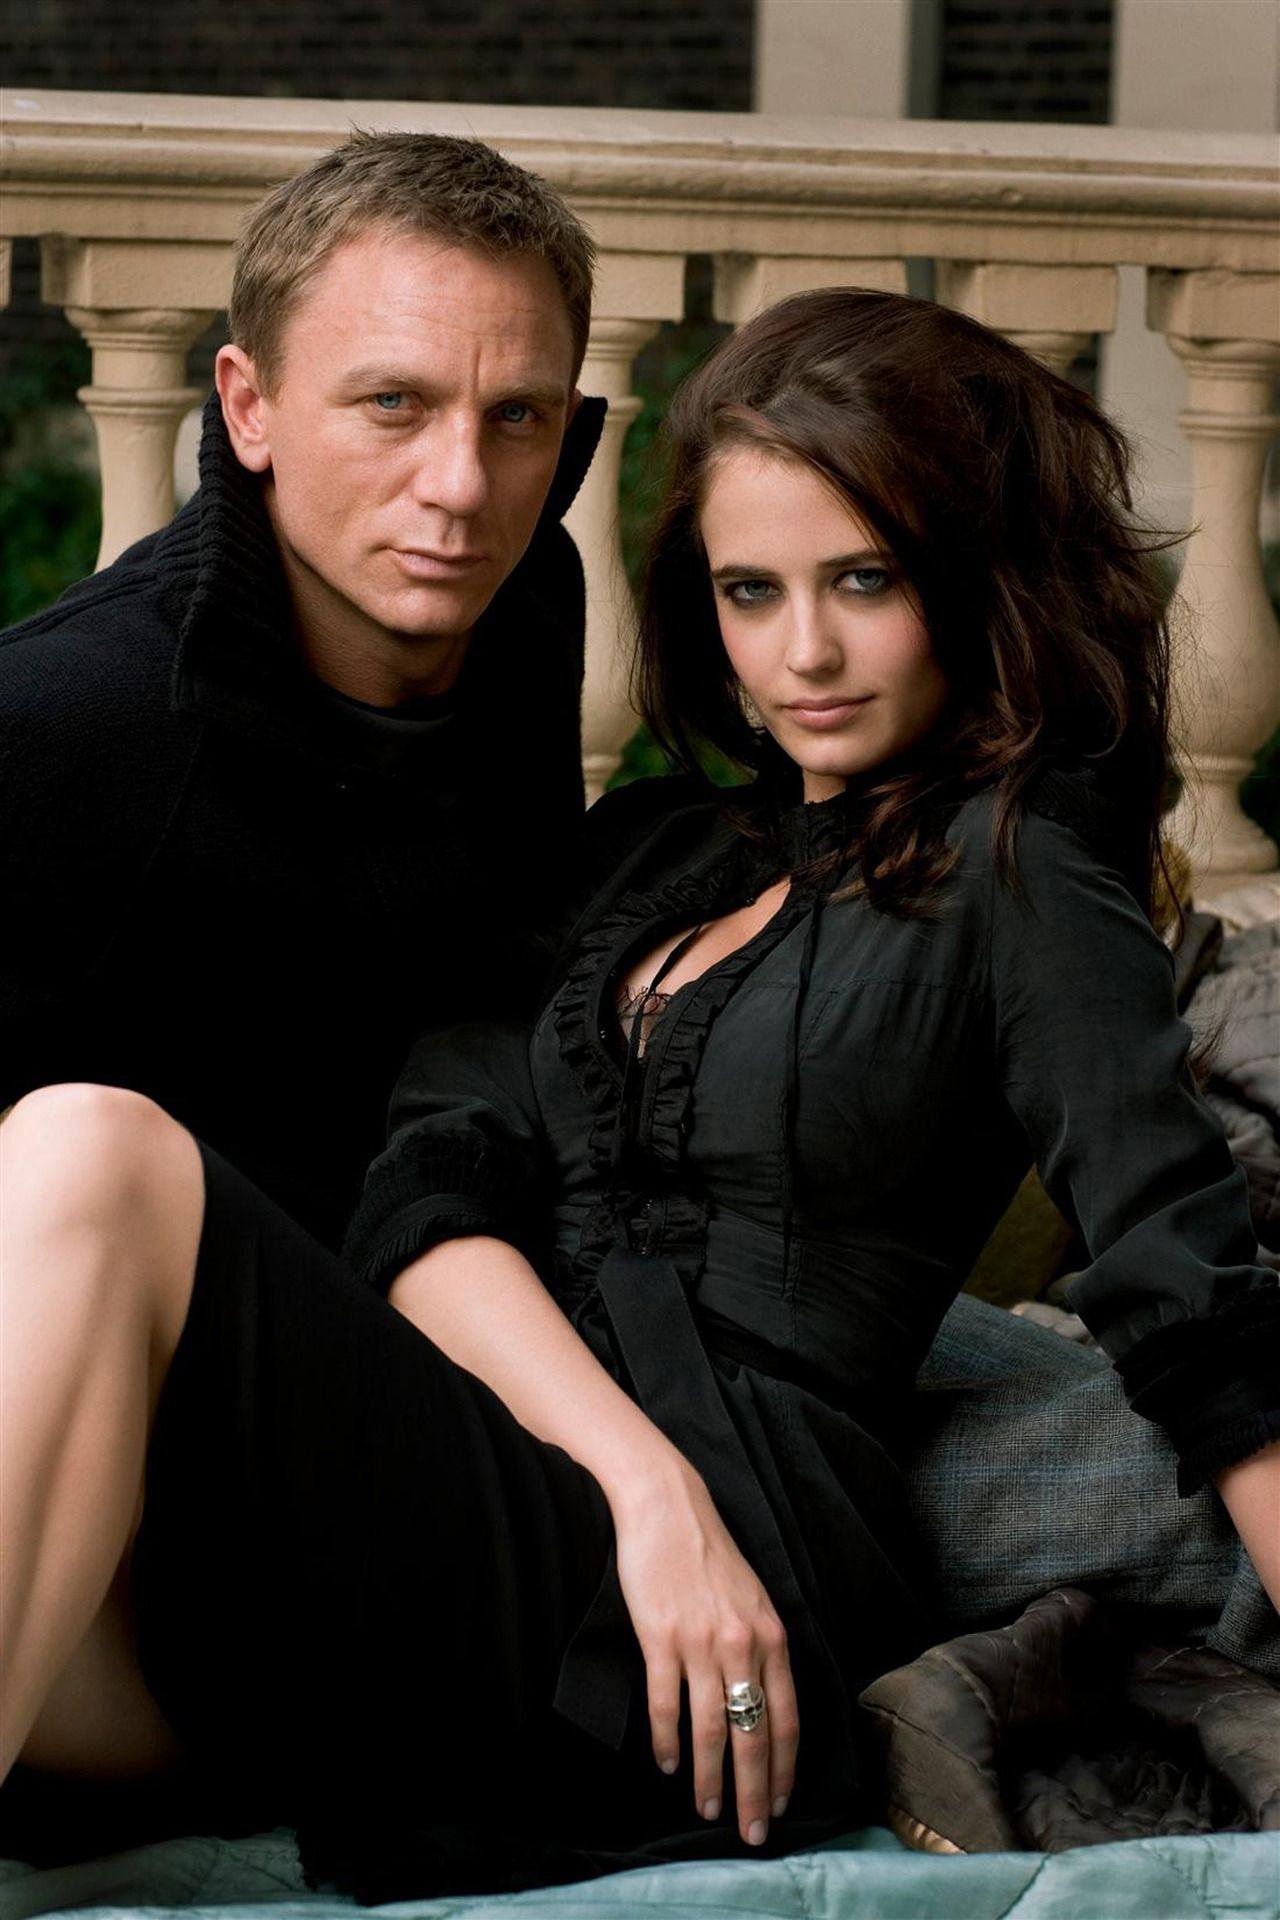 Looking back: Daniel Craig and Eva Green - 'Casino Royale'. #PutDownYourPhone #carde